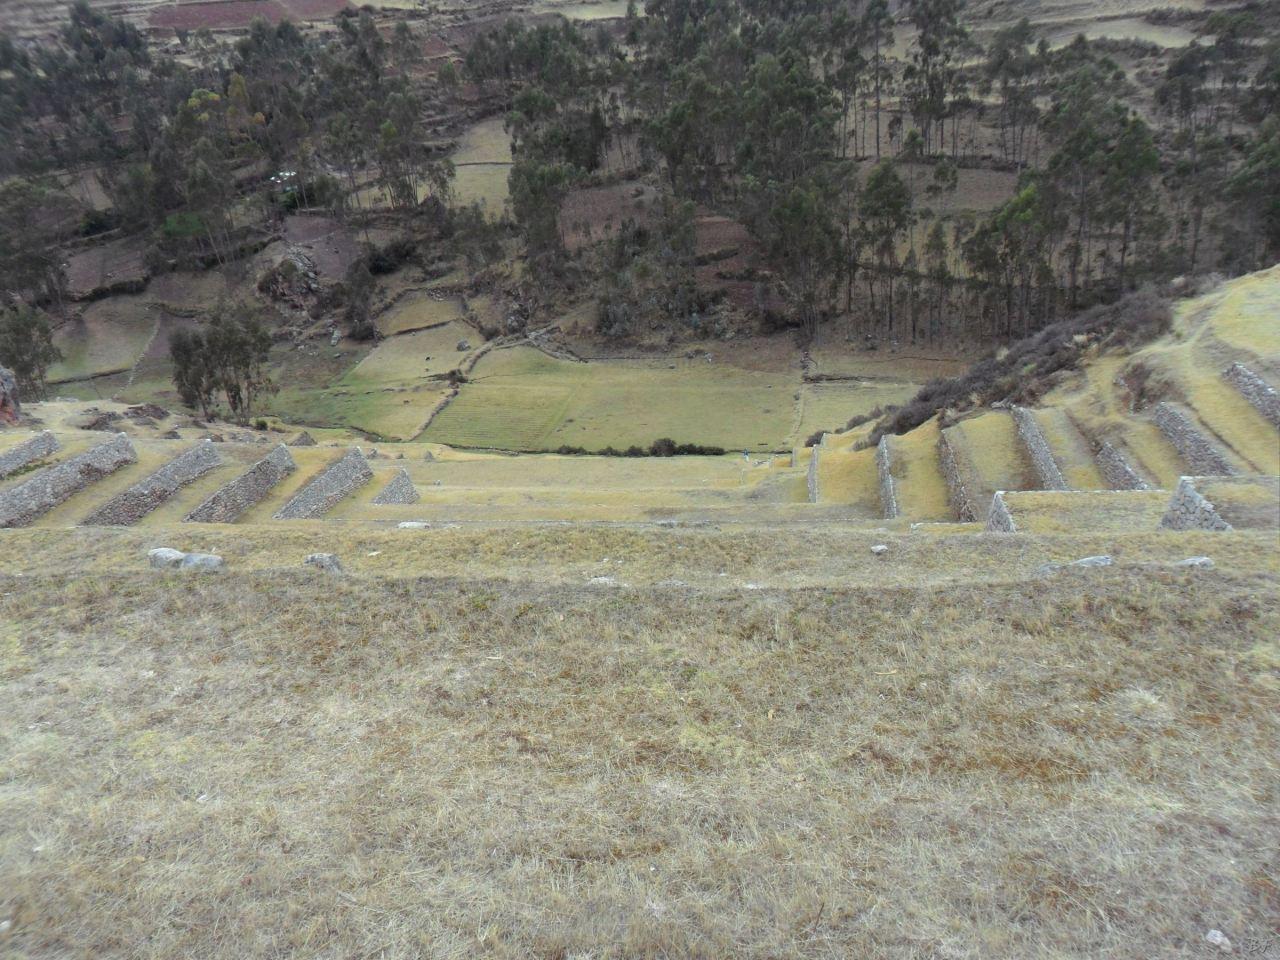 Chinchero-Mura-Poligonali-Piramide-Urubamba-Peru-53